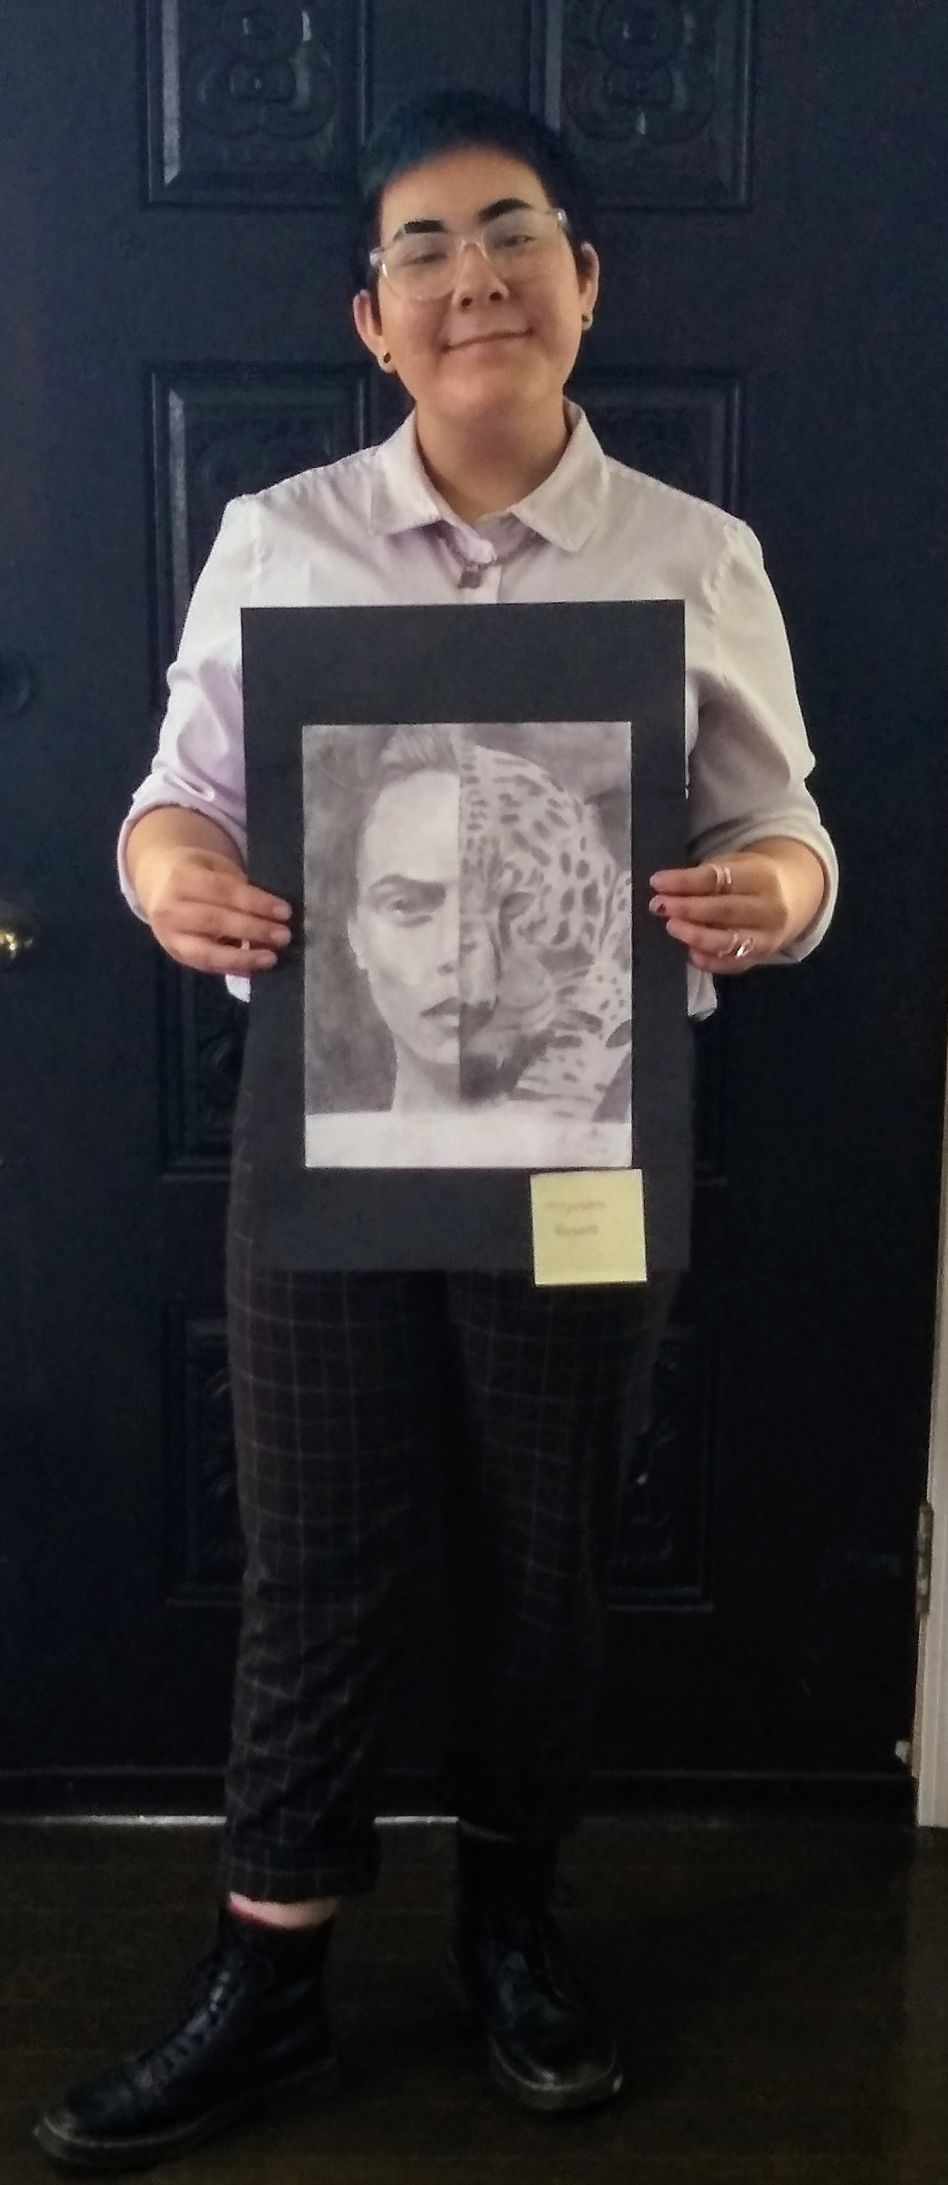 Woman's Club hosts student art contest